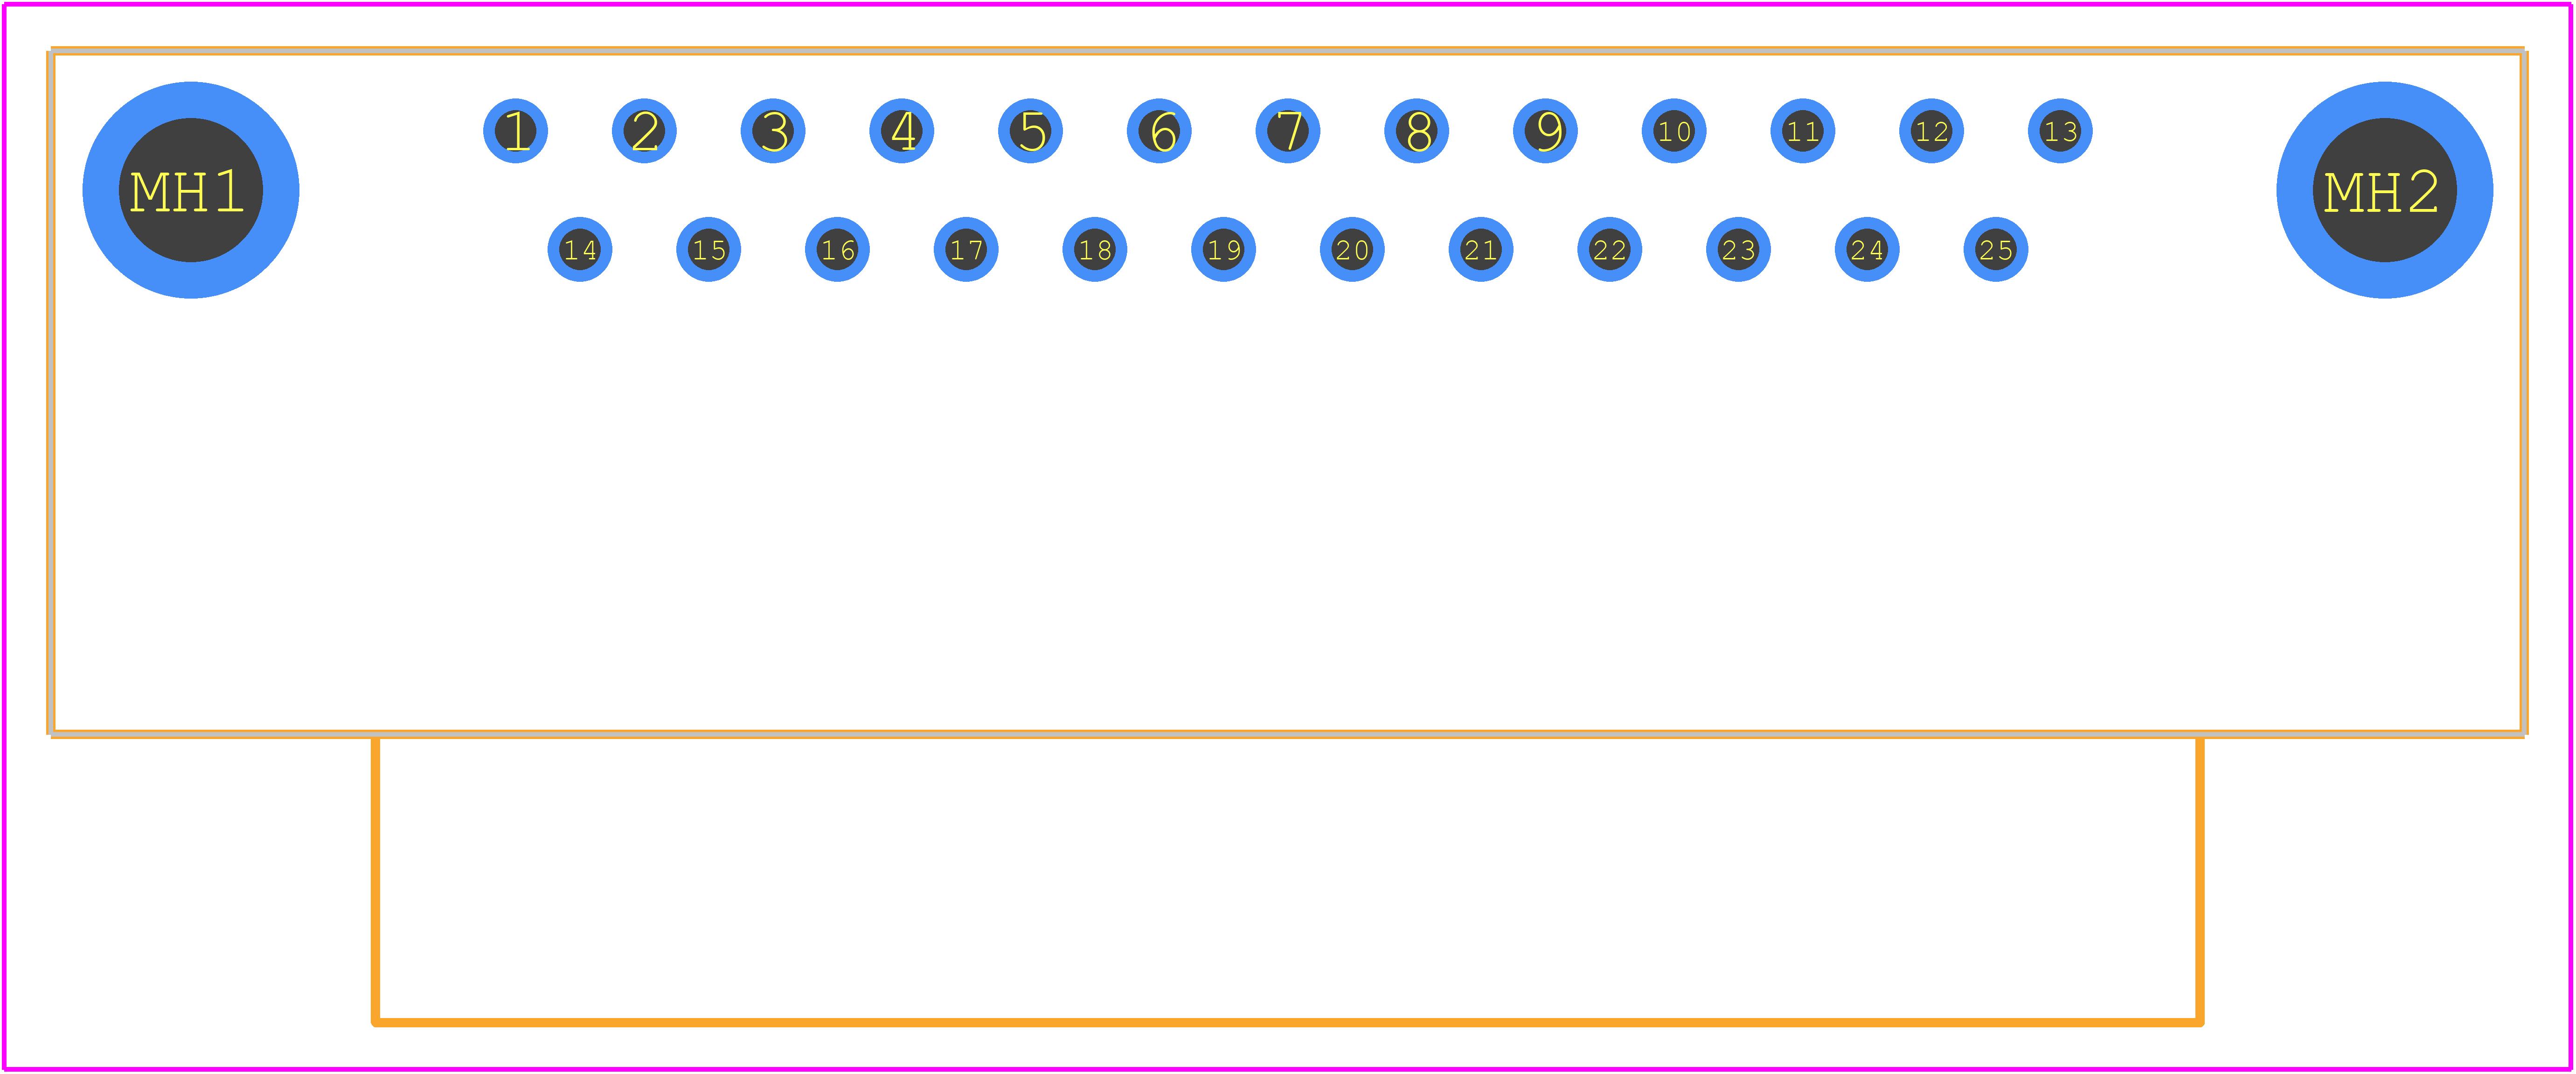 D25S13A4PL00LF - FCI PCB footprint - Other - D25S13A4PL00LF